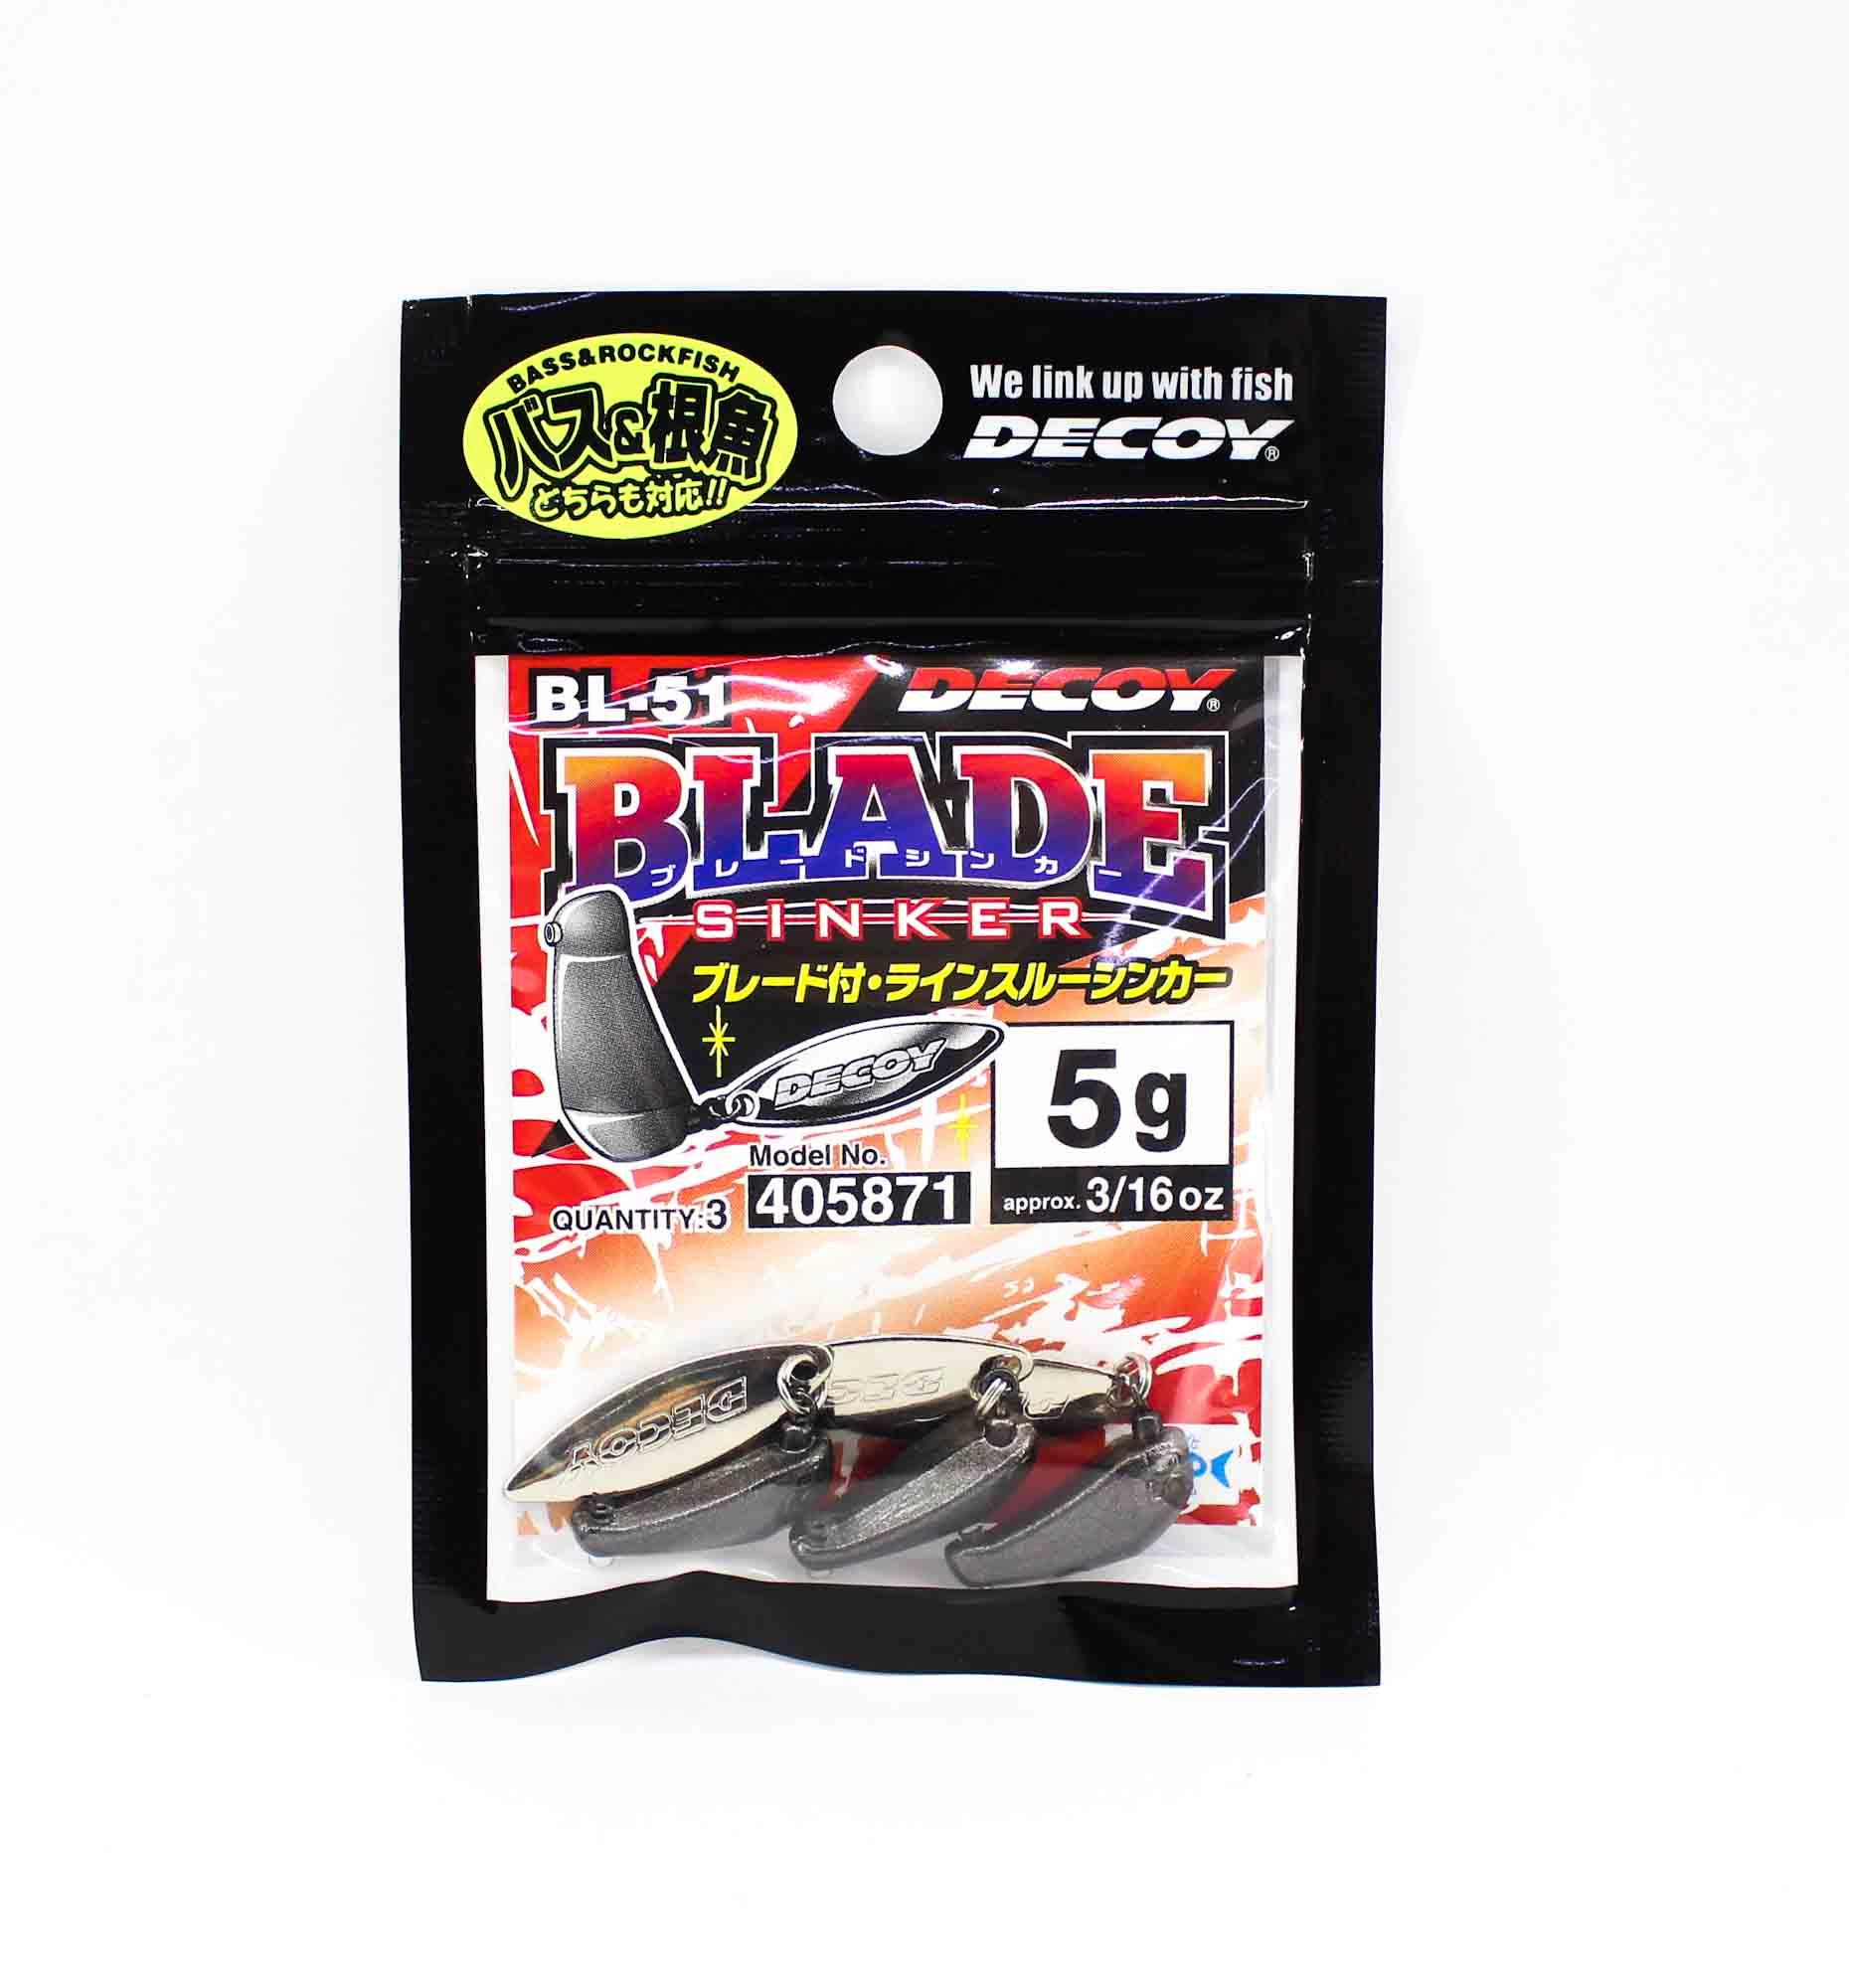 Decoy BL-51 Blade Sinker Size 5 grams (5871)